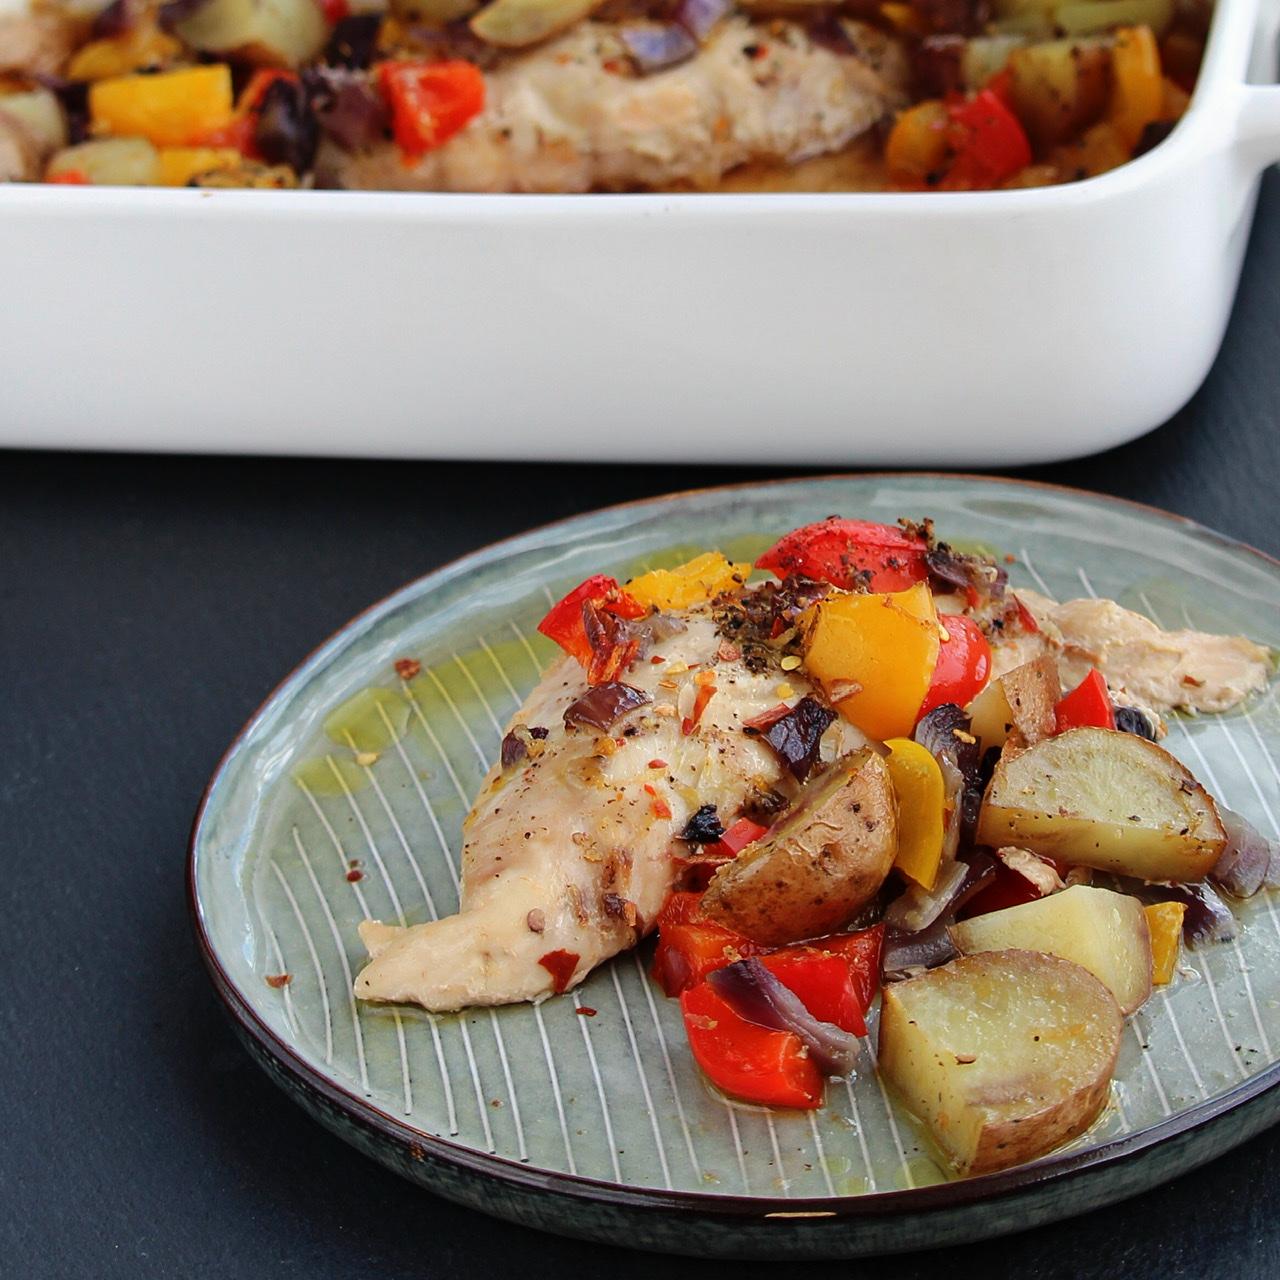 Lemon-Pepper Chicken and Potatoes